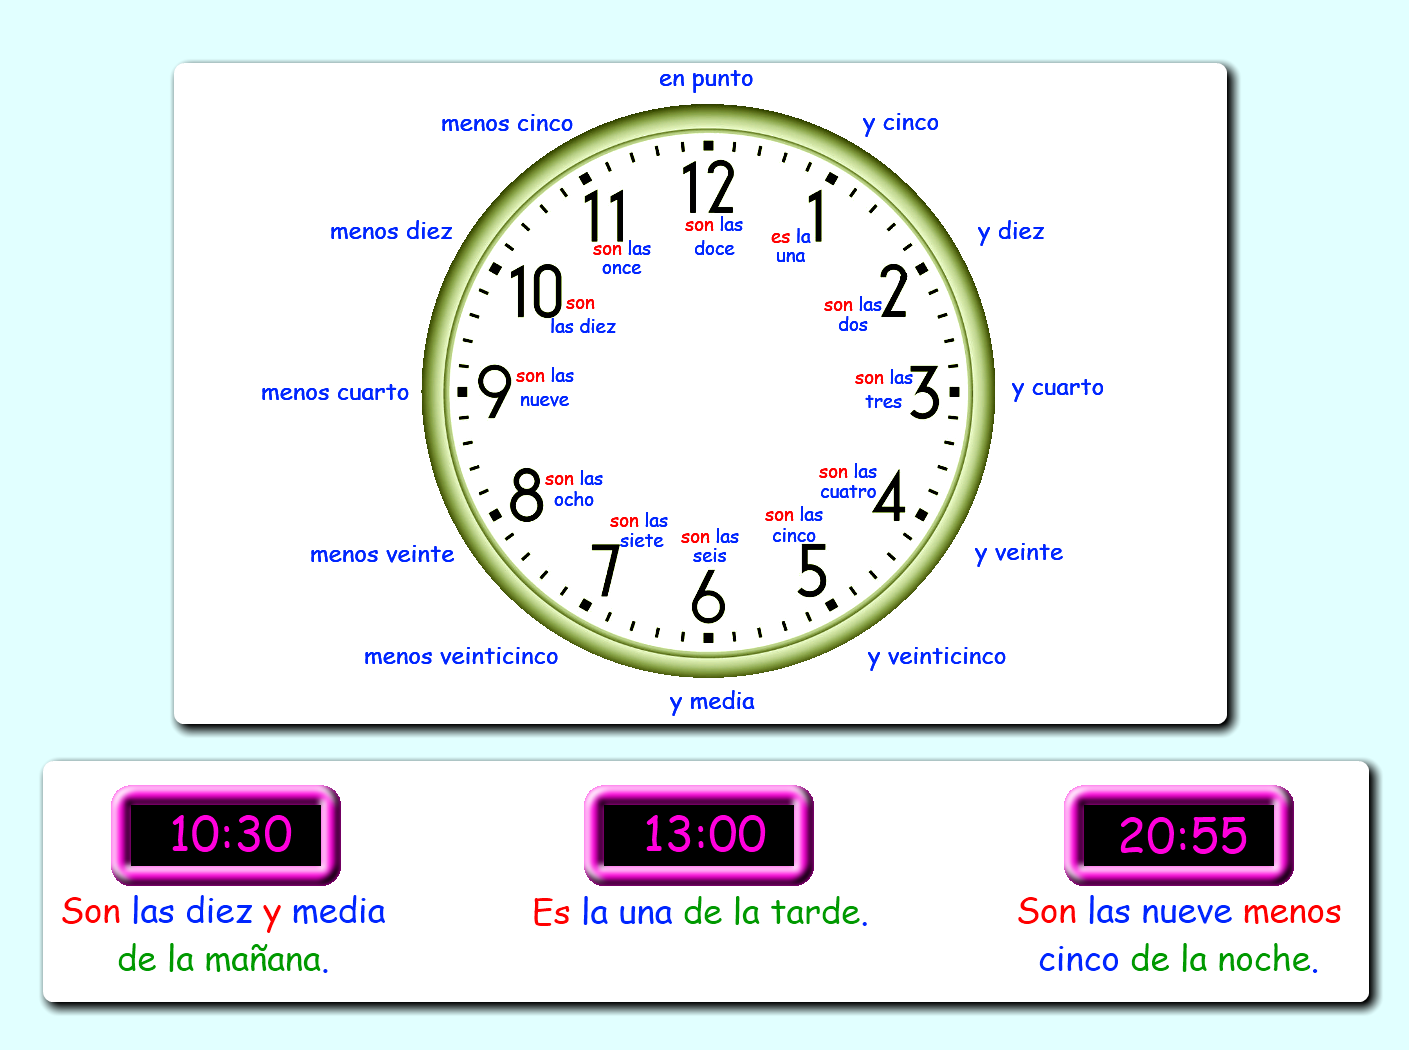 La Hora 1 409 1 050 Pixeles